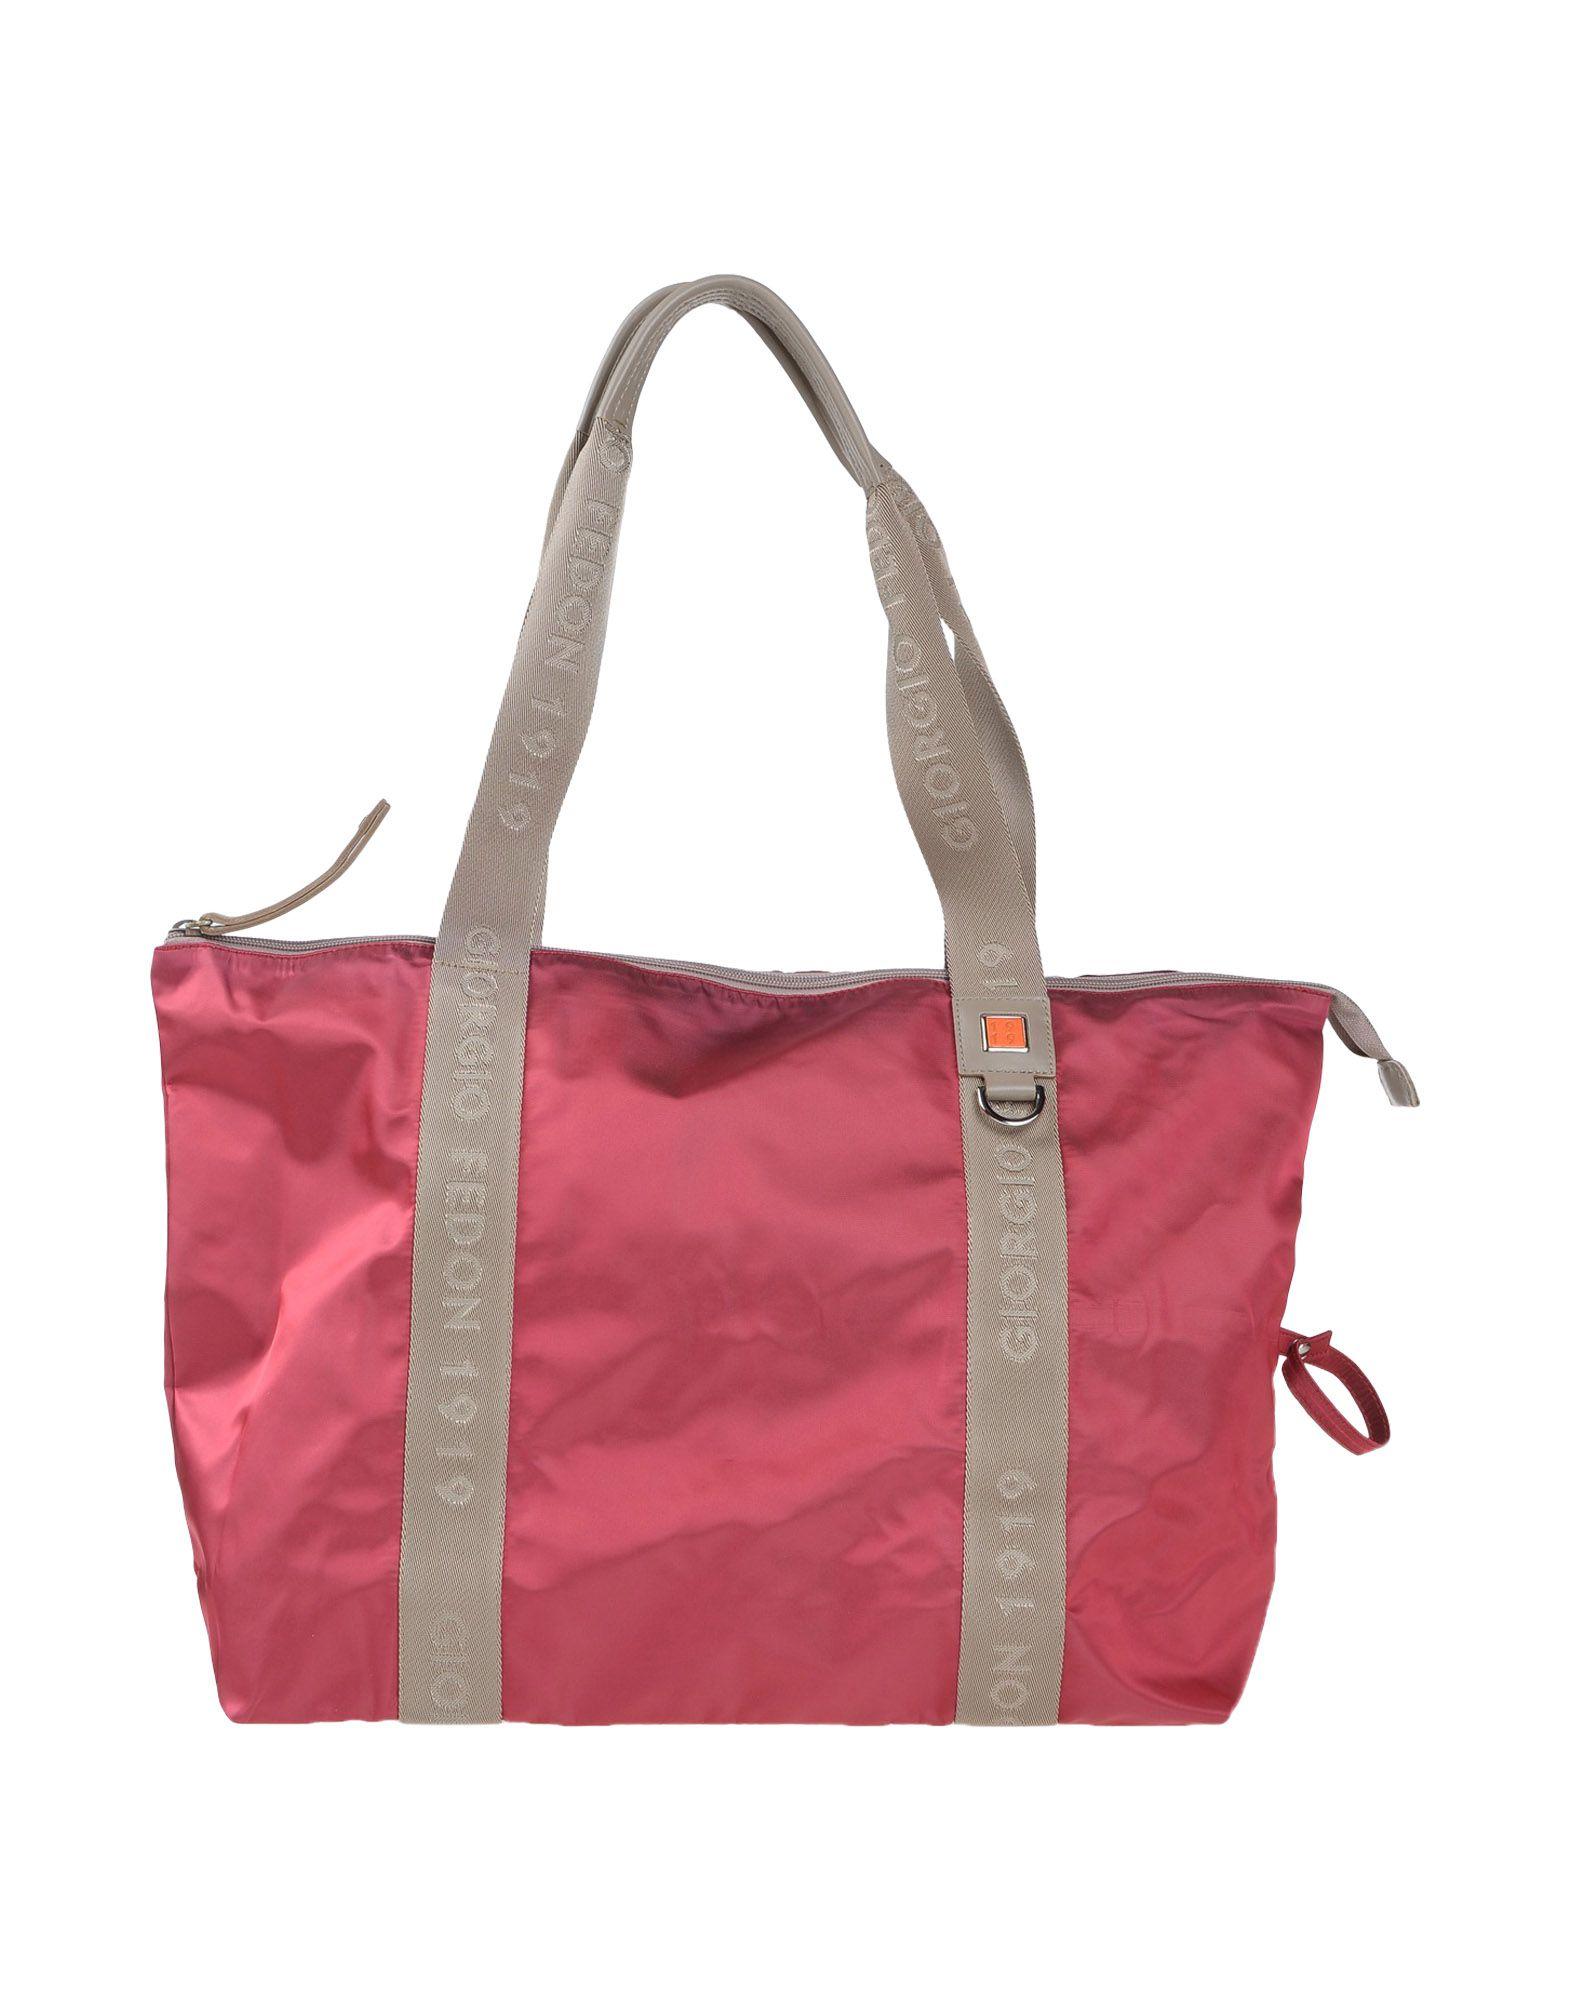 Giorgio fedon Handbag in Pink